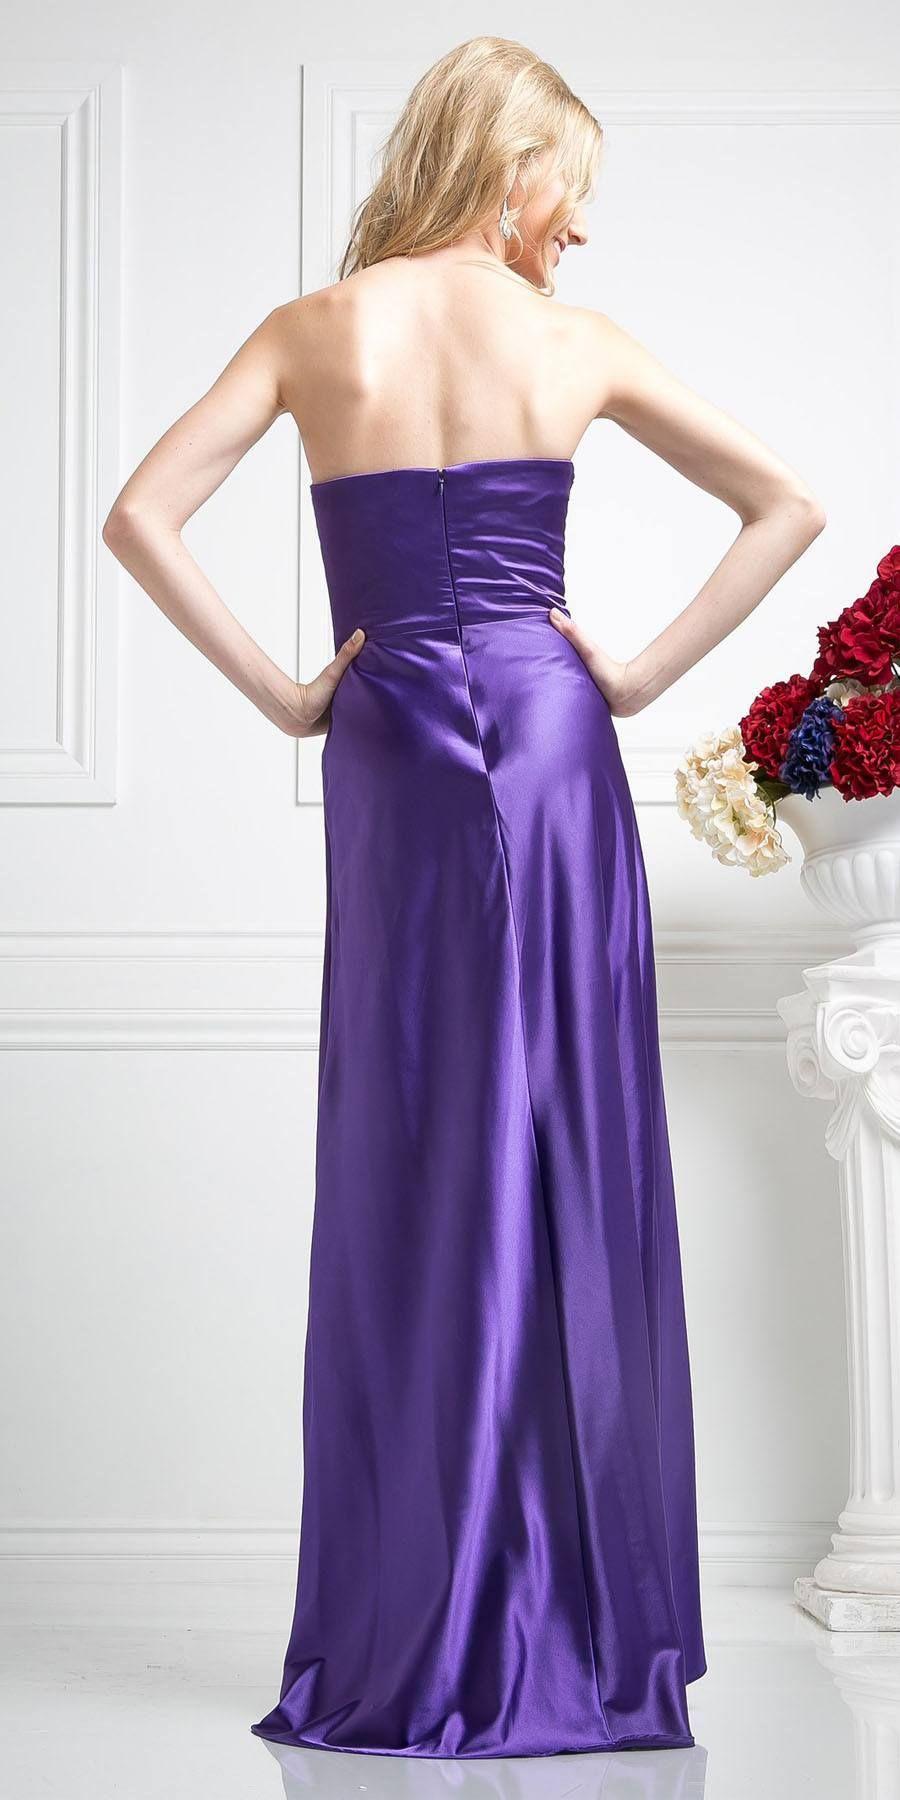 Long strapless purple formal dress satin rhinestone